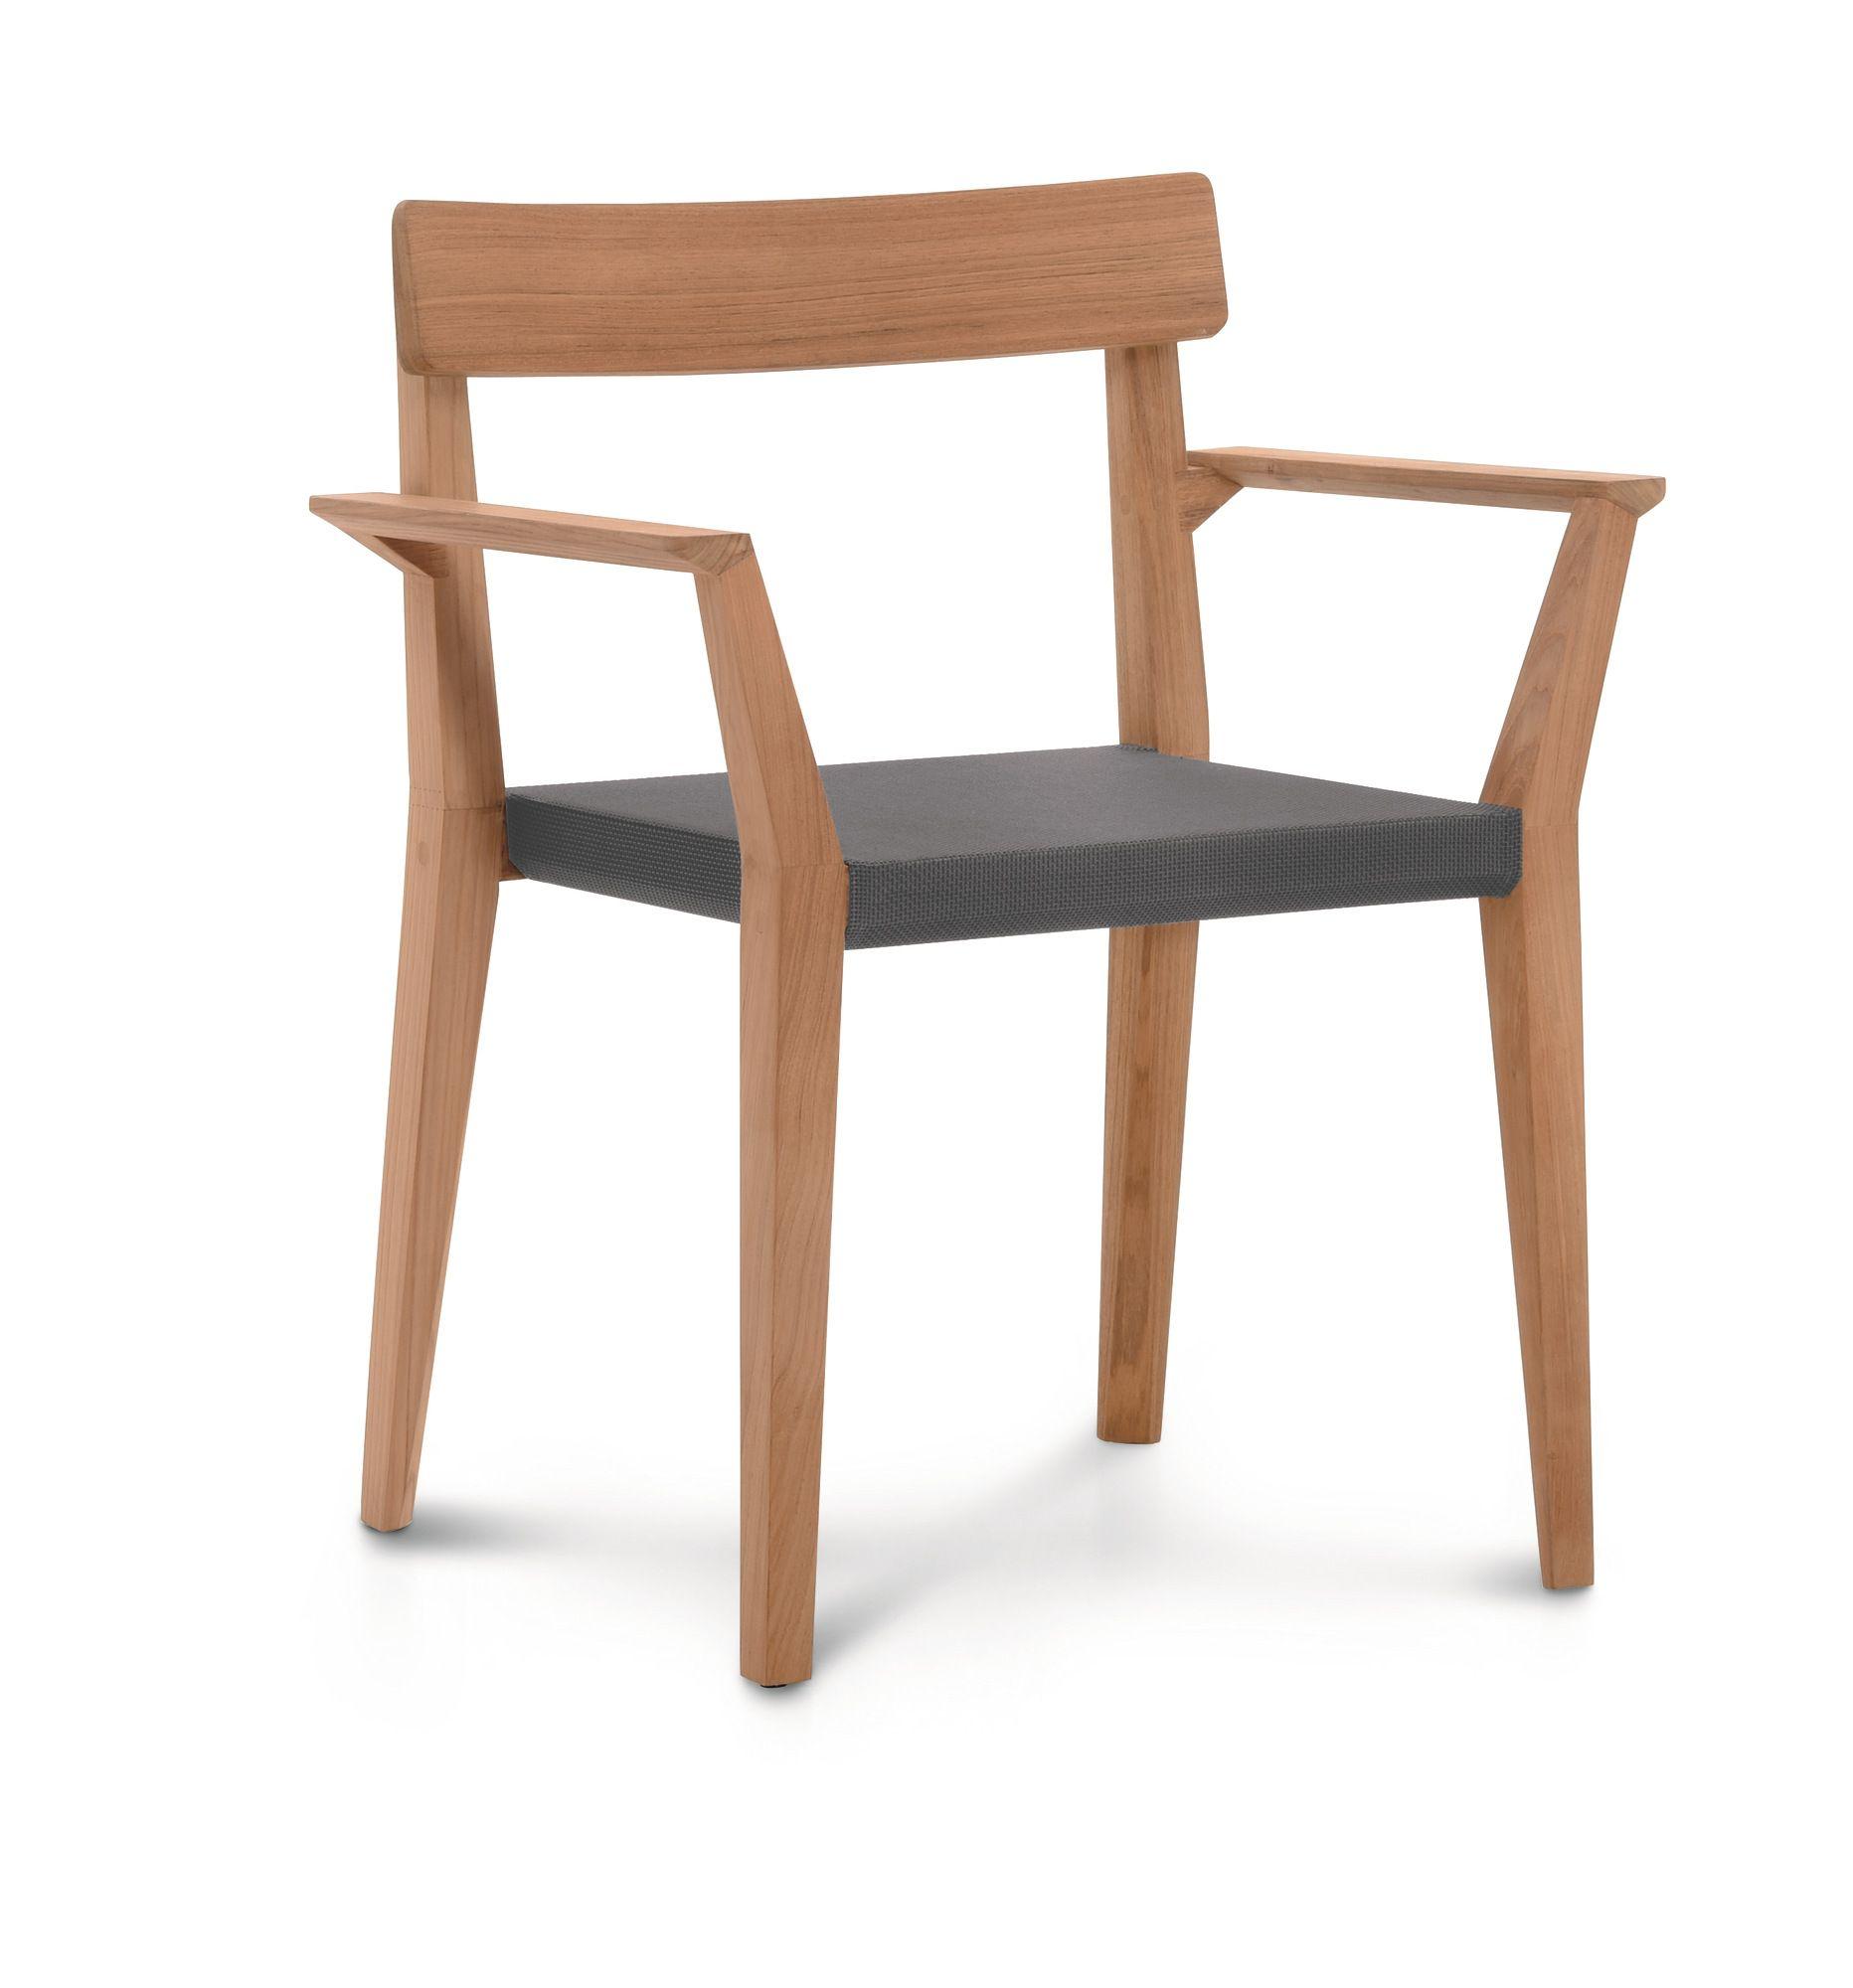 teka stuhl mit armlehnen by roda design gordon guillaumier. Black Bedroom Furniture Sets. Home Design Ideas